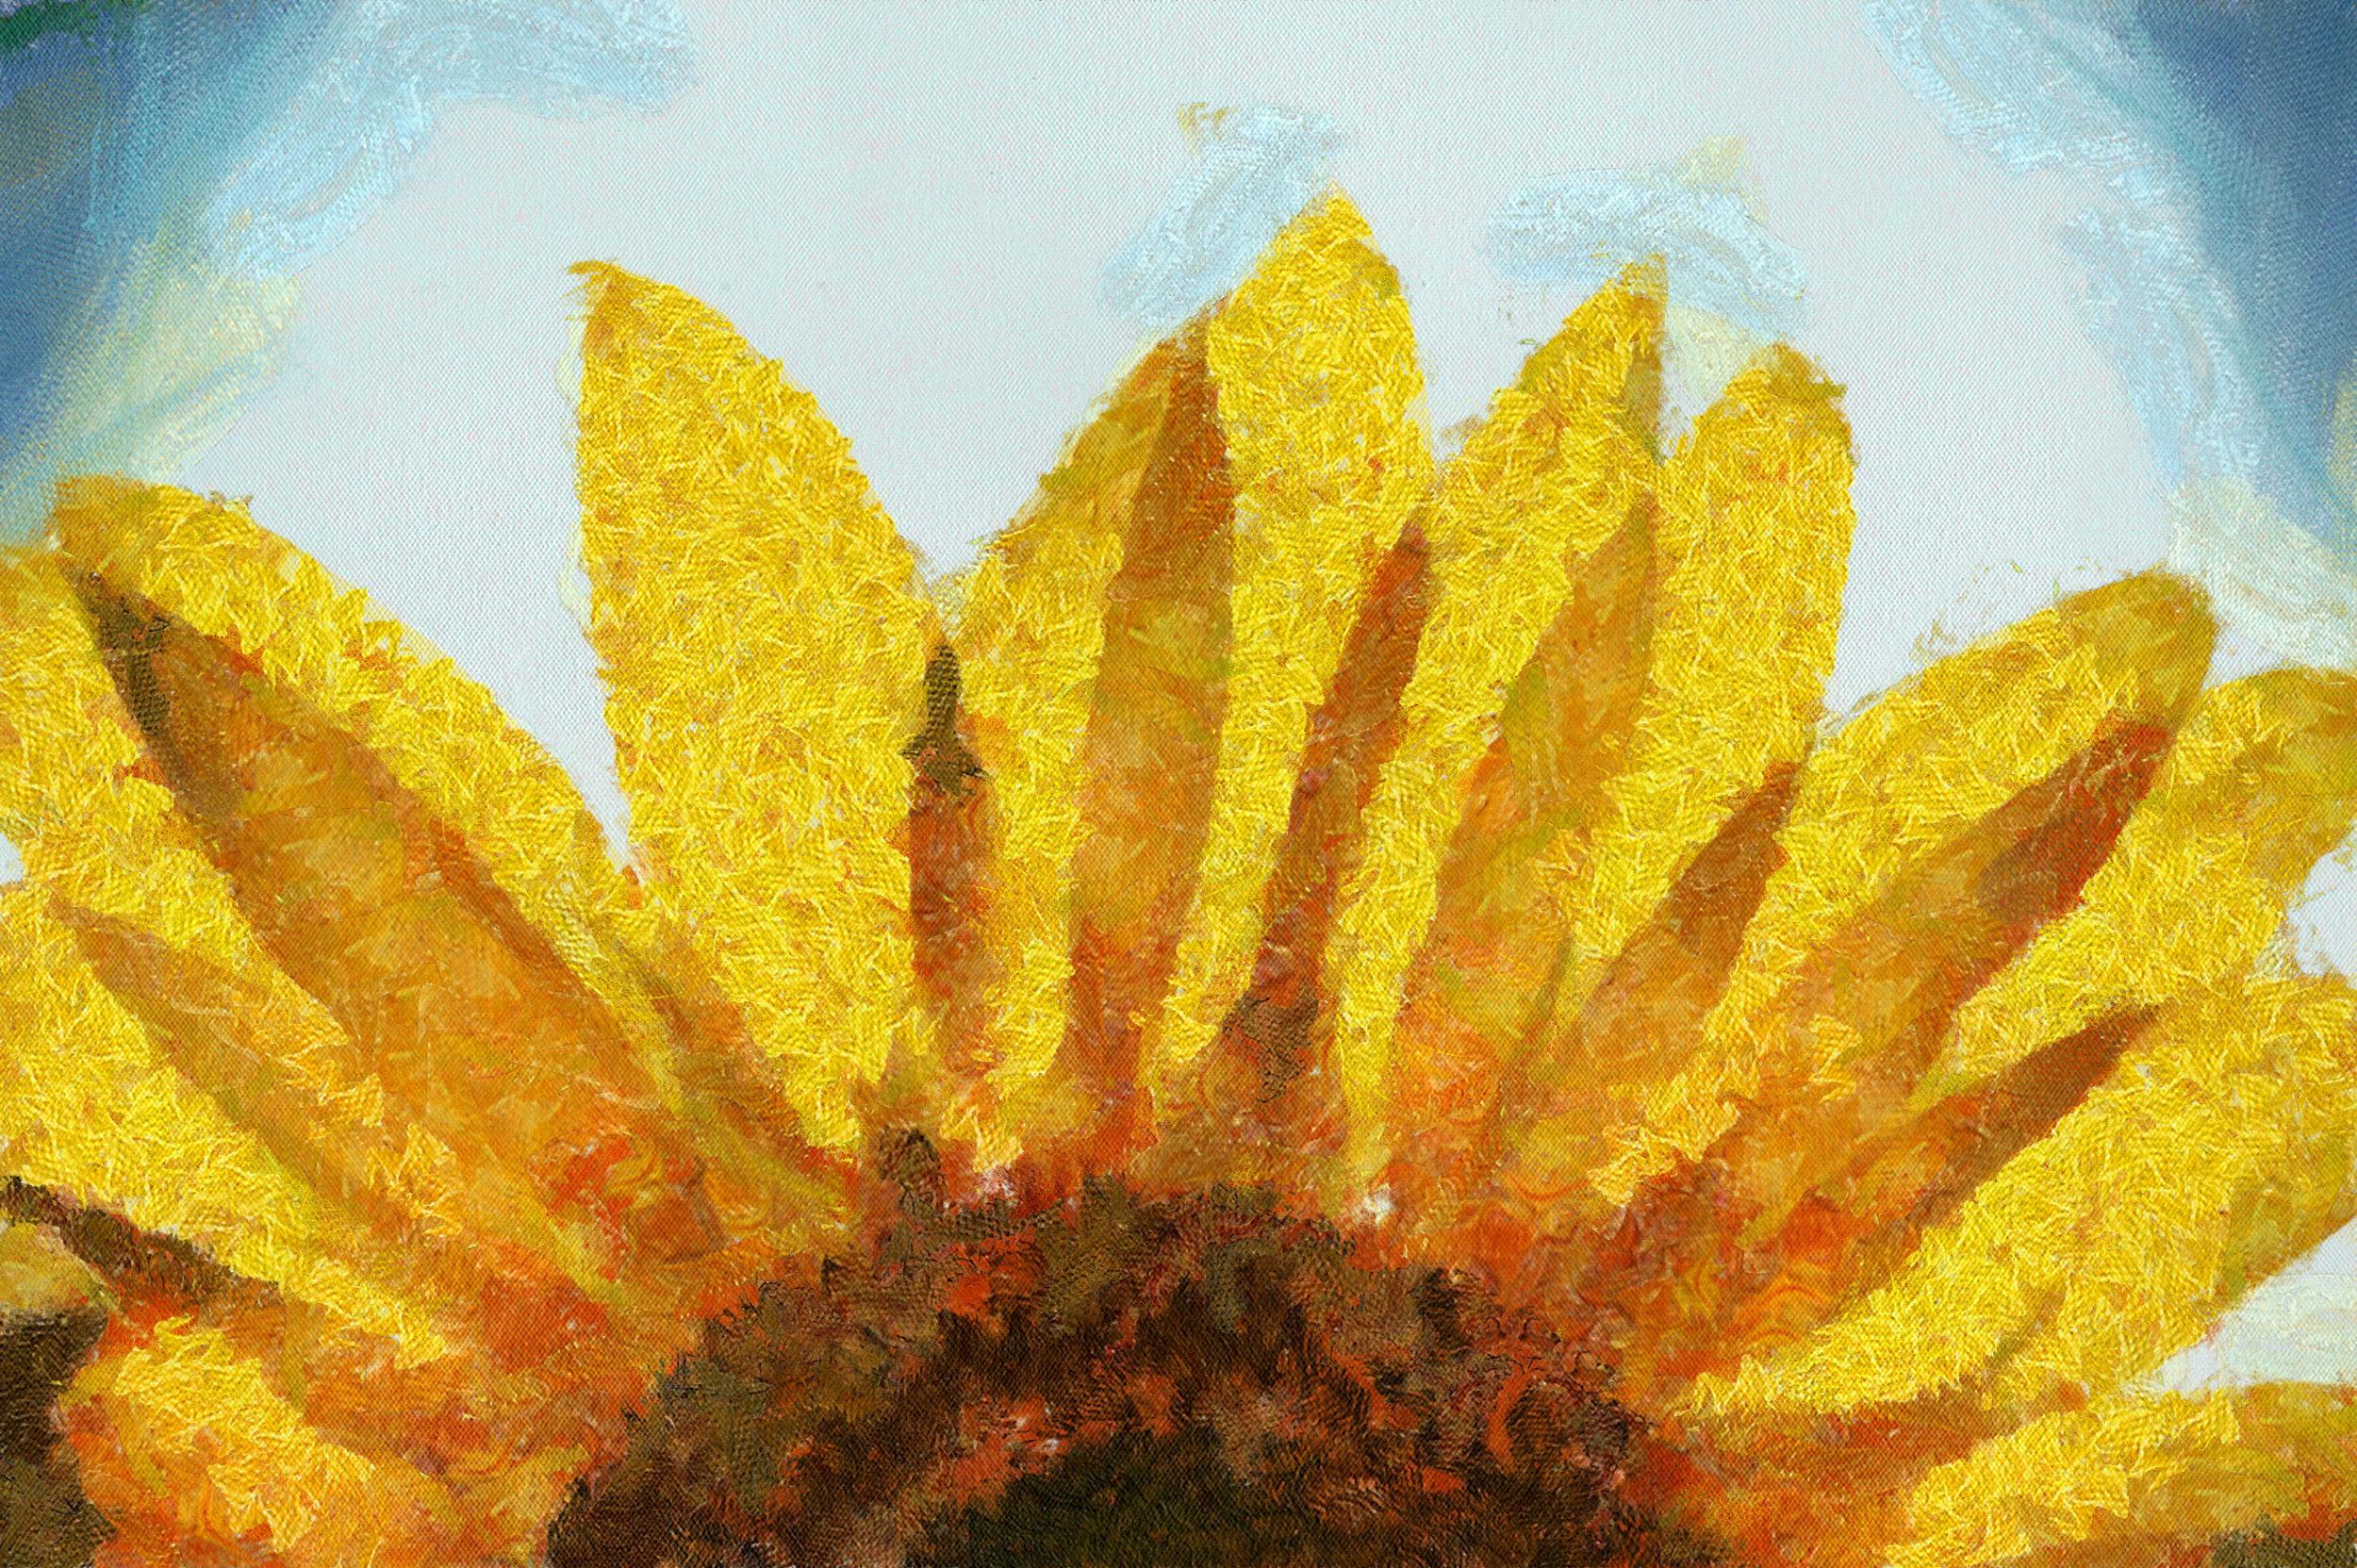 sunflower-2071186_960_720_DAP_Camille.jpg